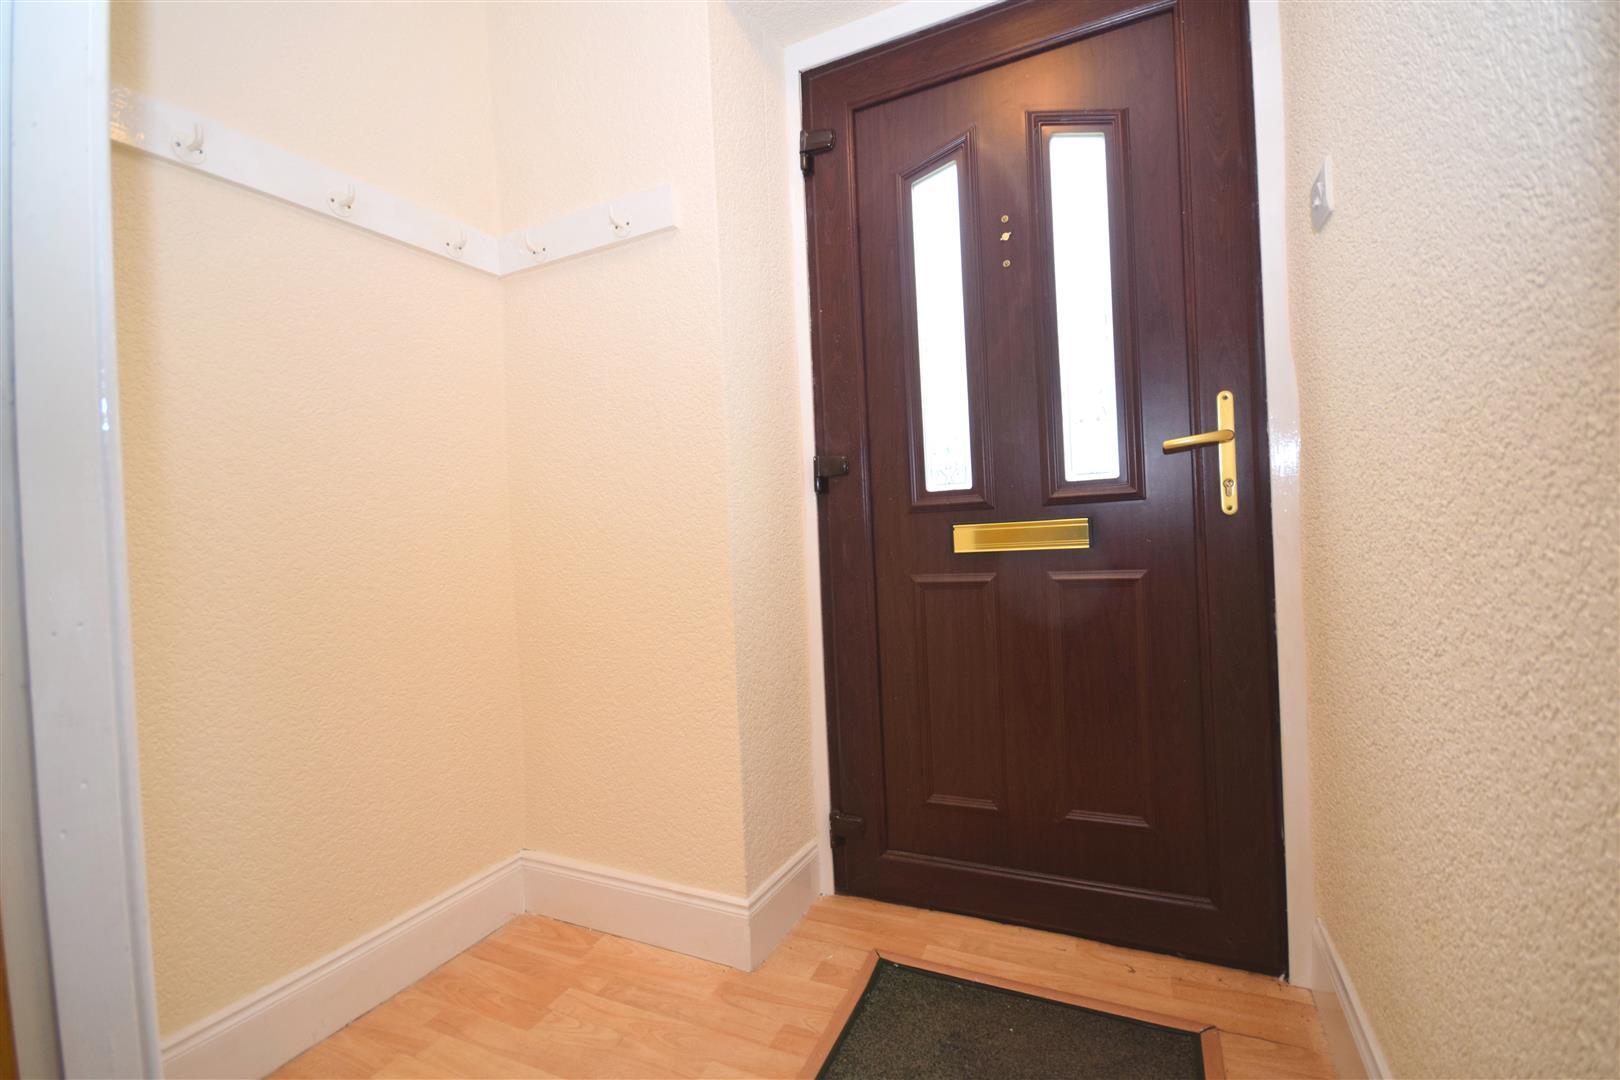 19, Percy Street, Stanley, Perthshire, PH1 4LU, UK